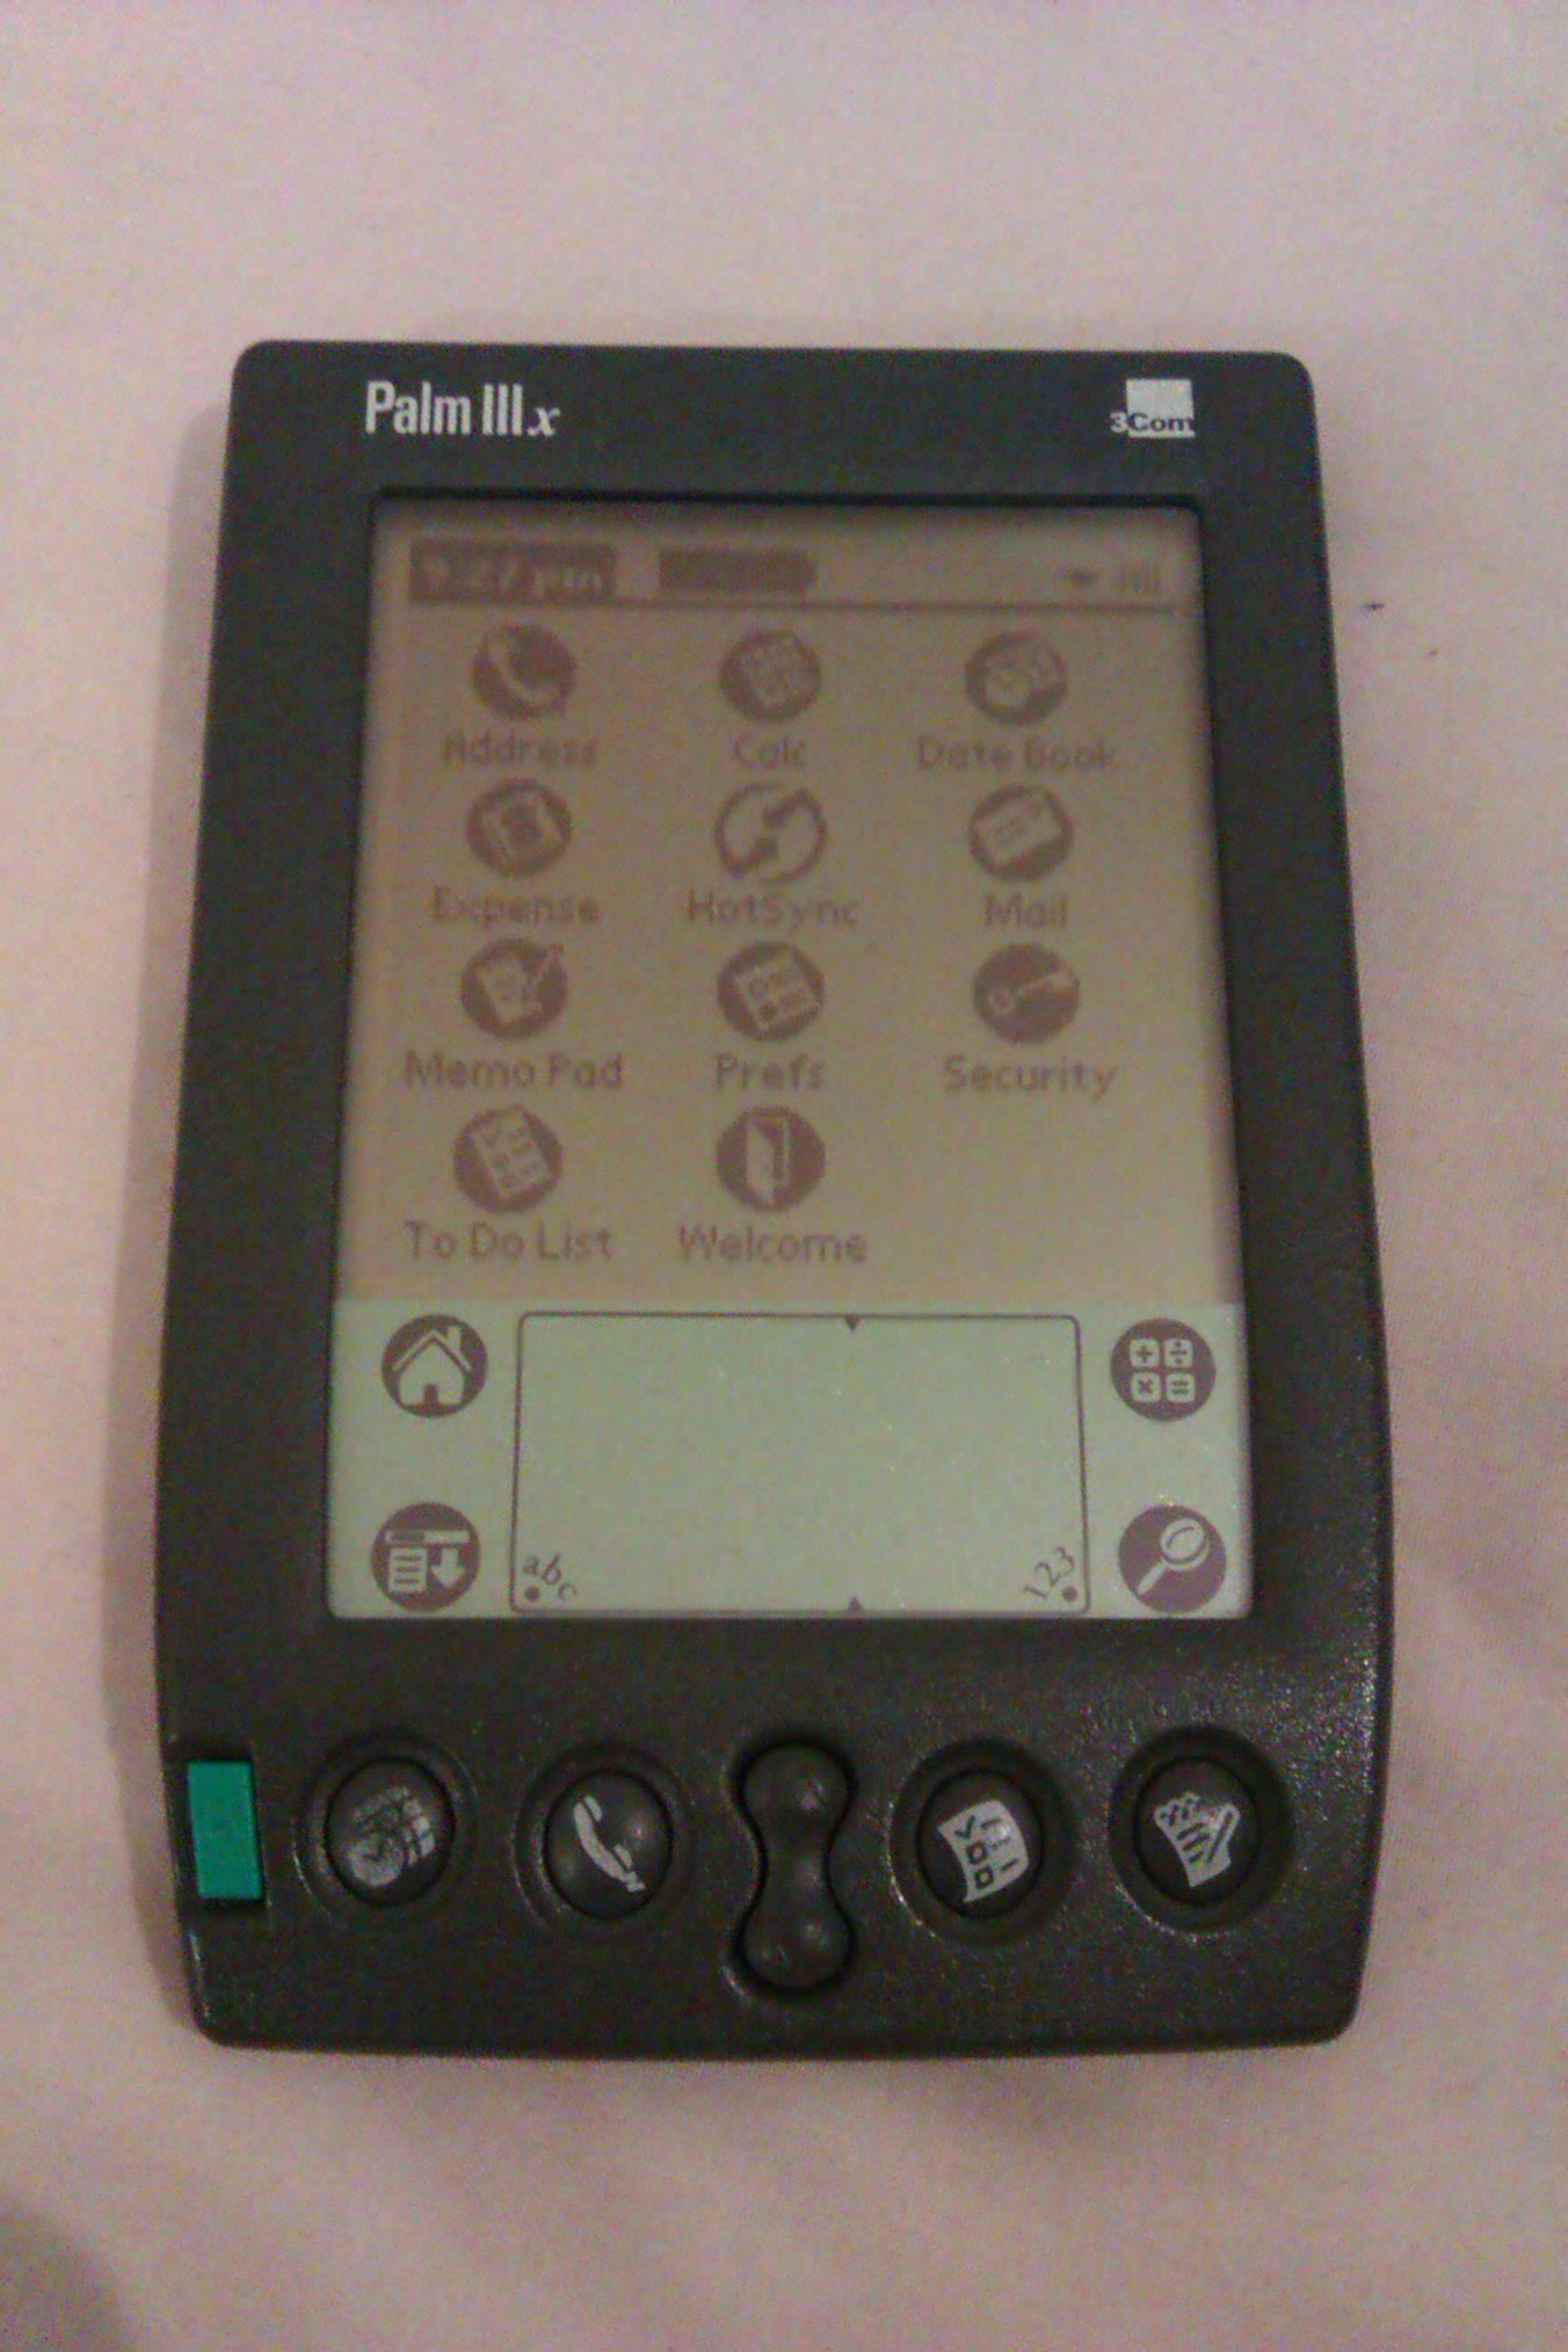 Palm IIIx - Wikipedia